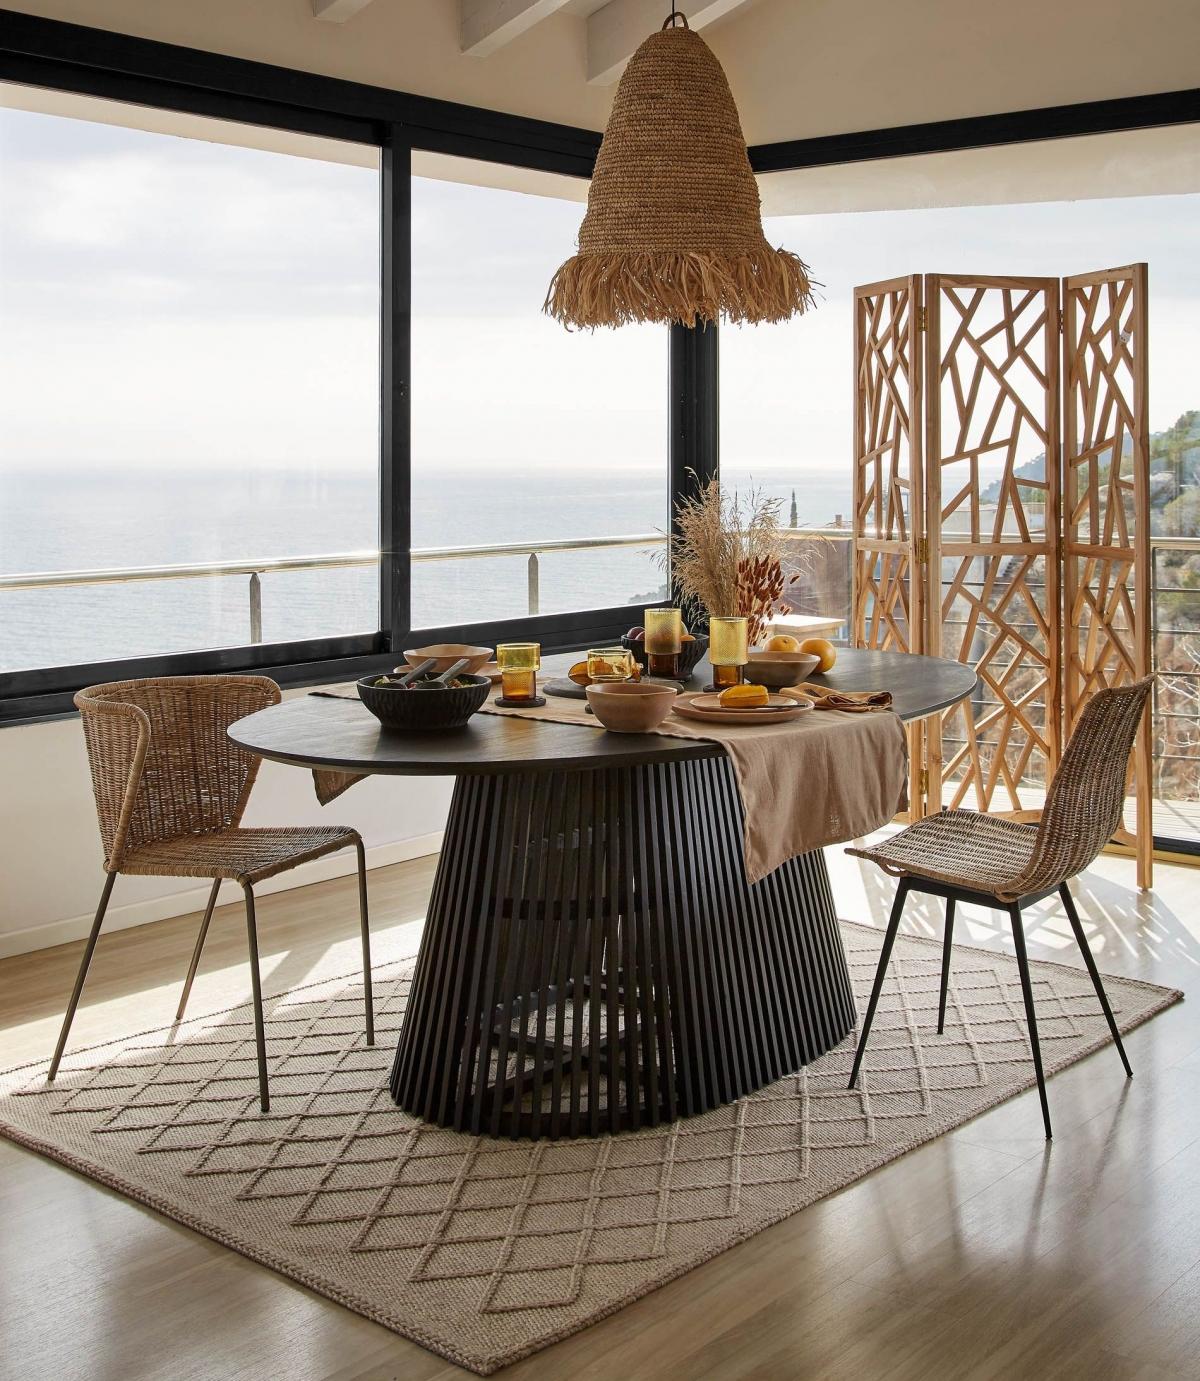 Уютная веранда с видом на море